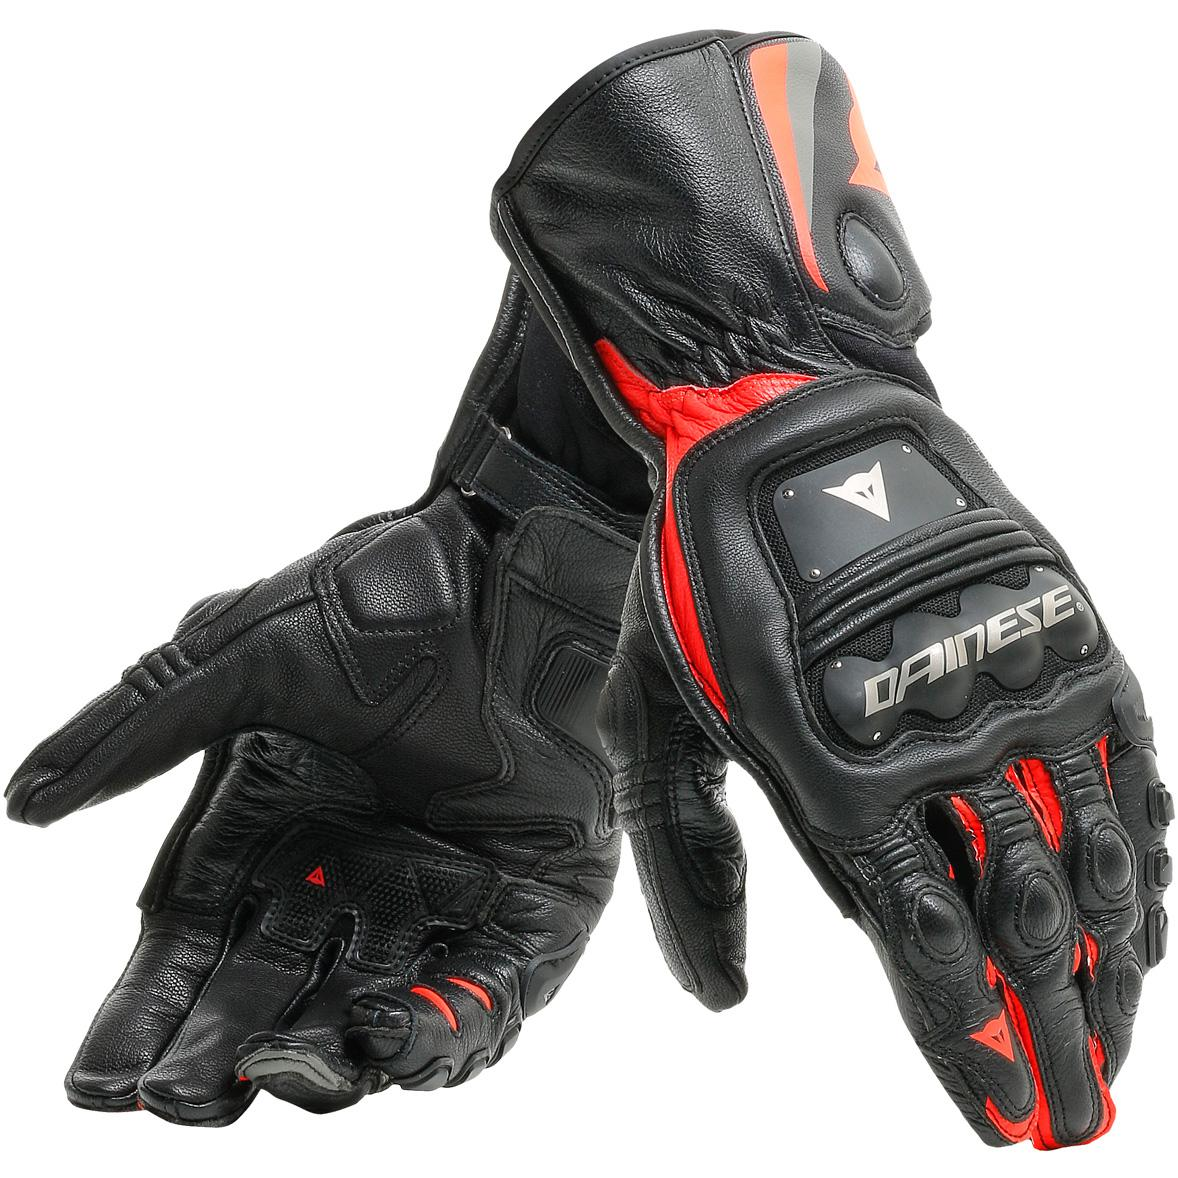 DAINESE-gants-steel-pro-image-10938943